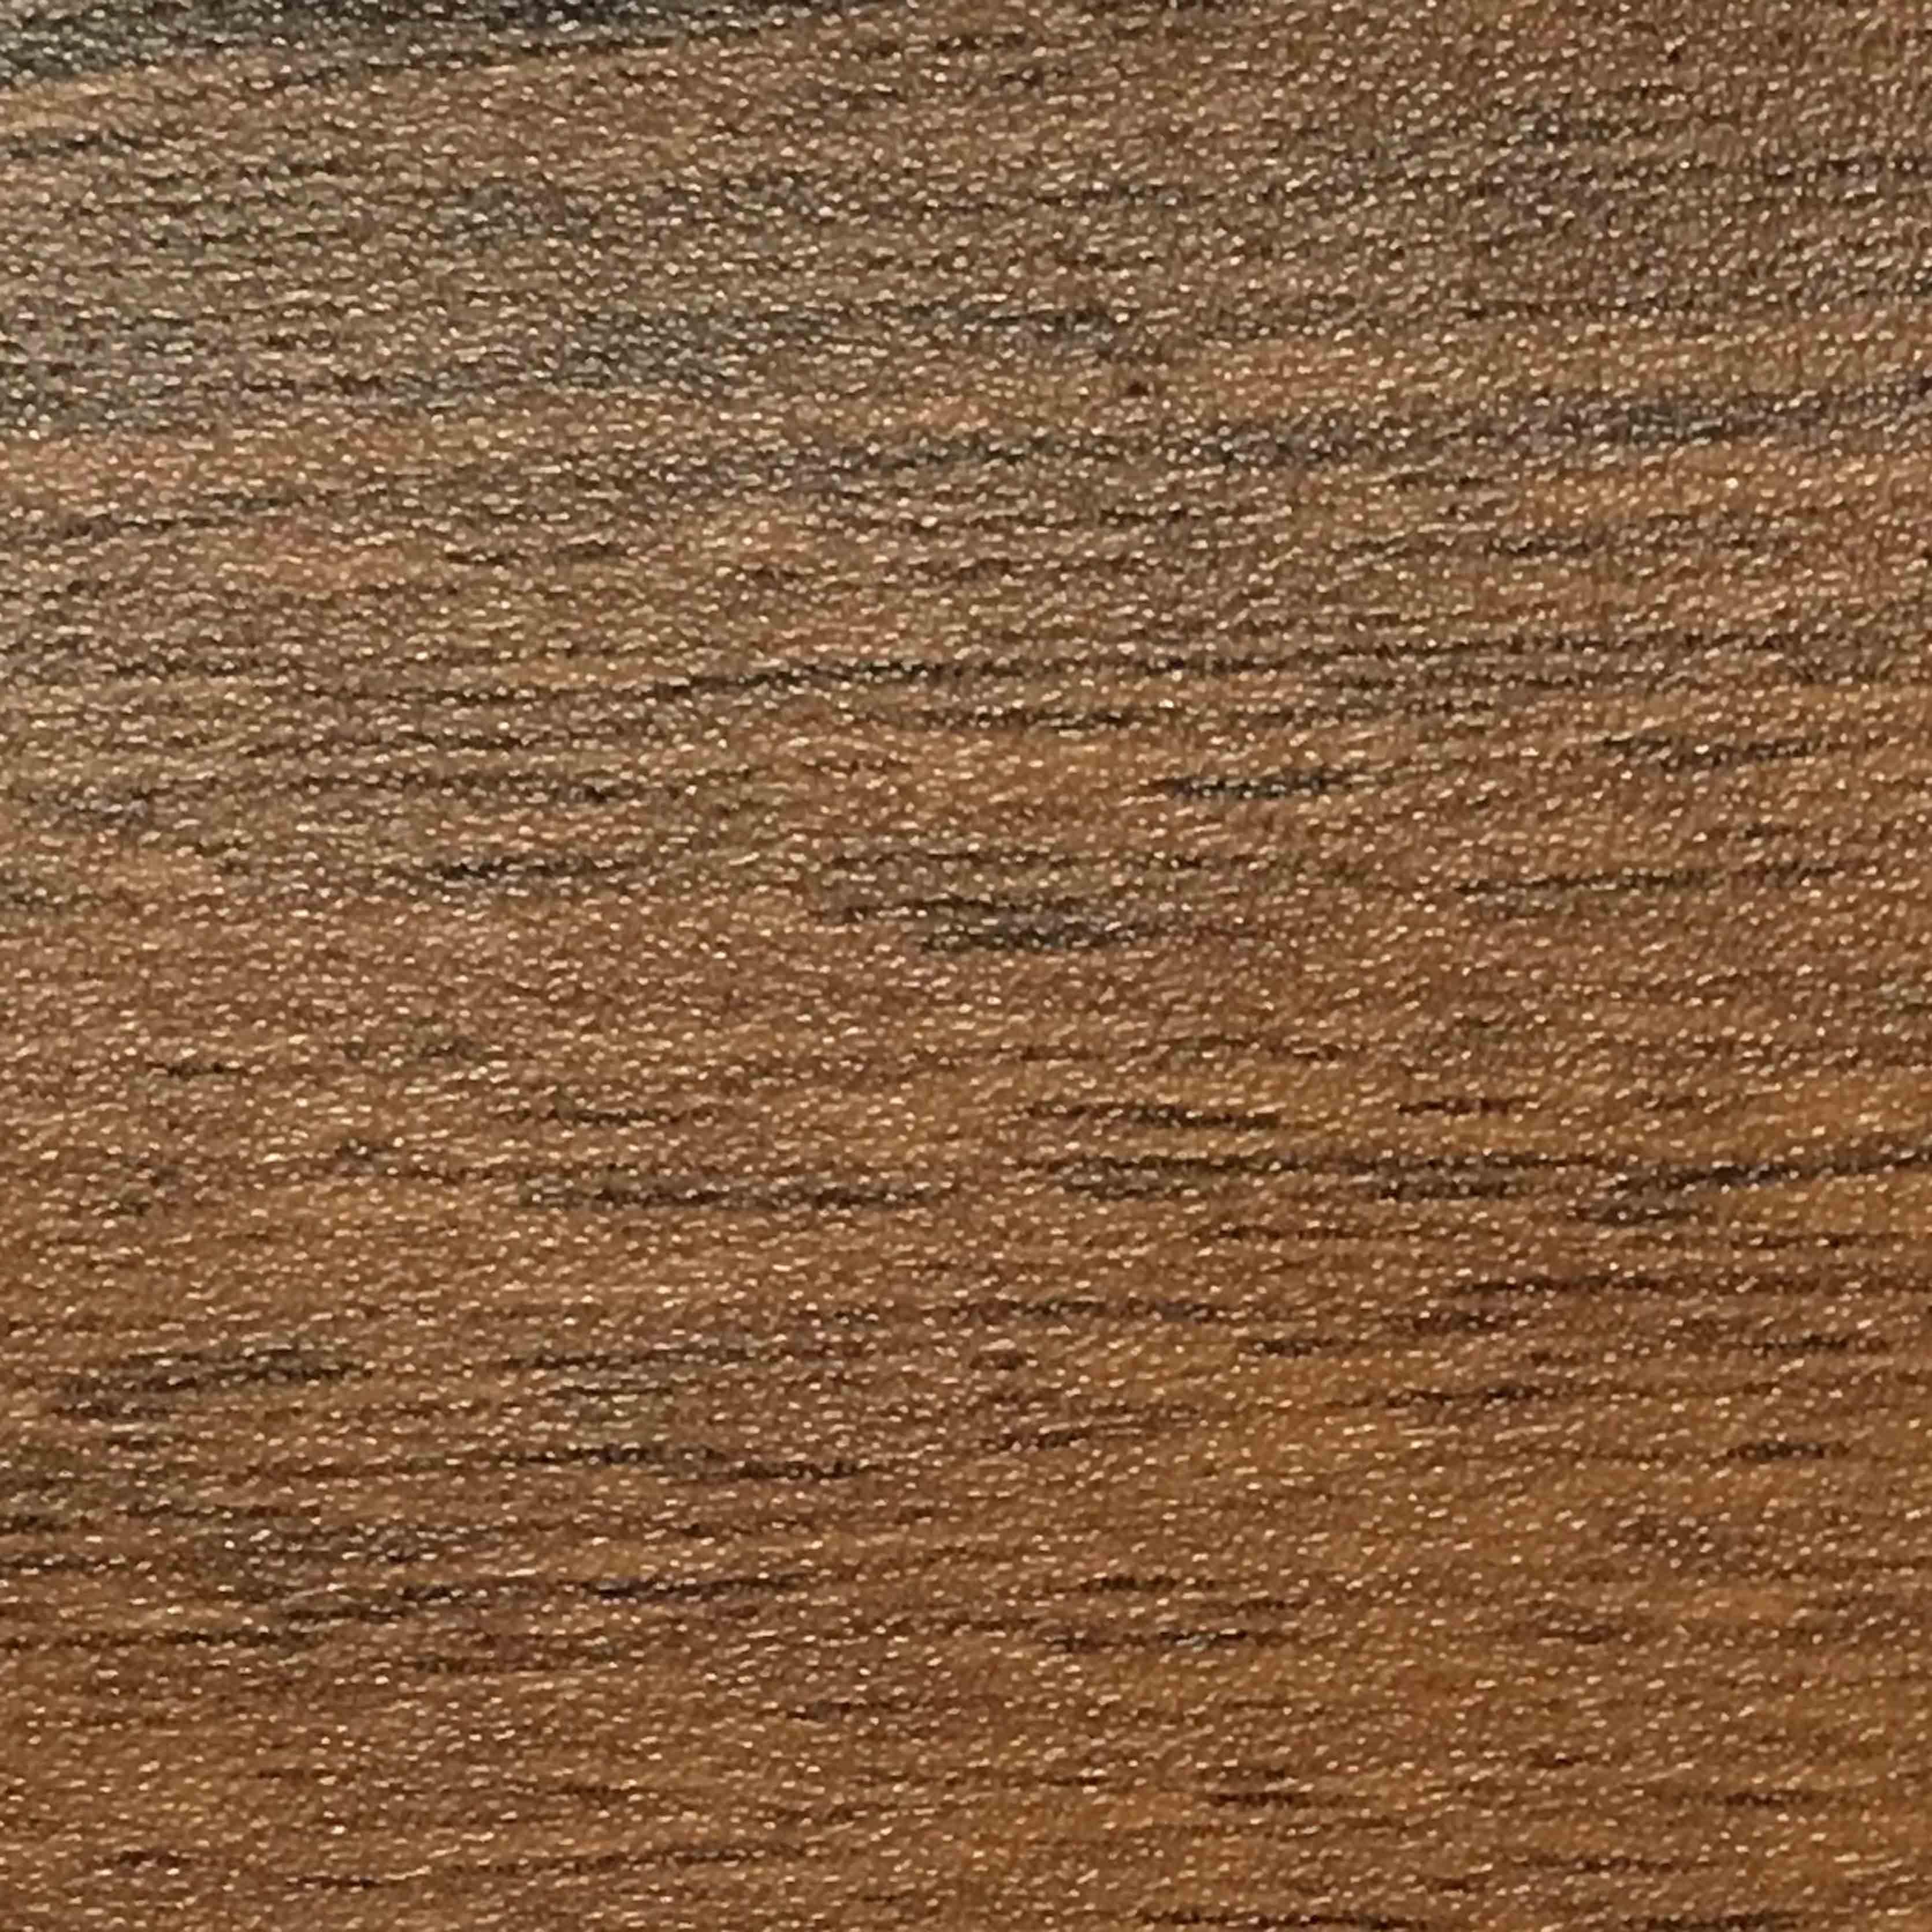 Decal vân gỗ - 3080